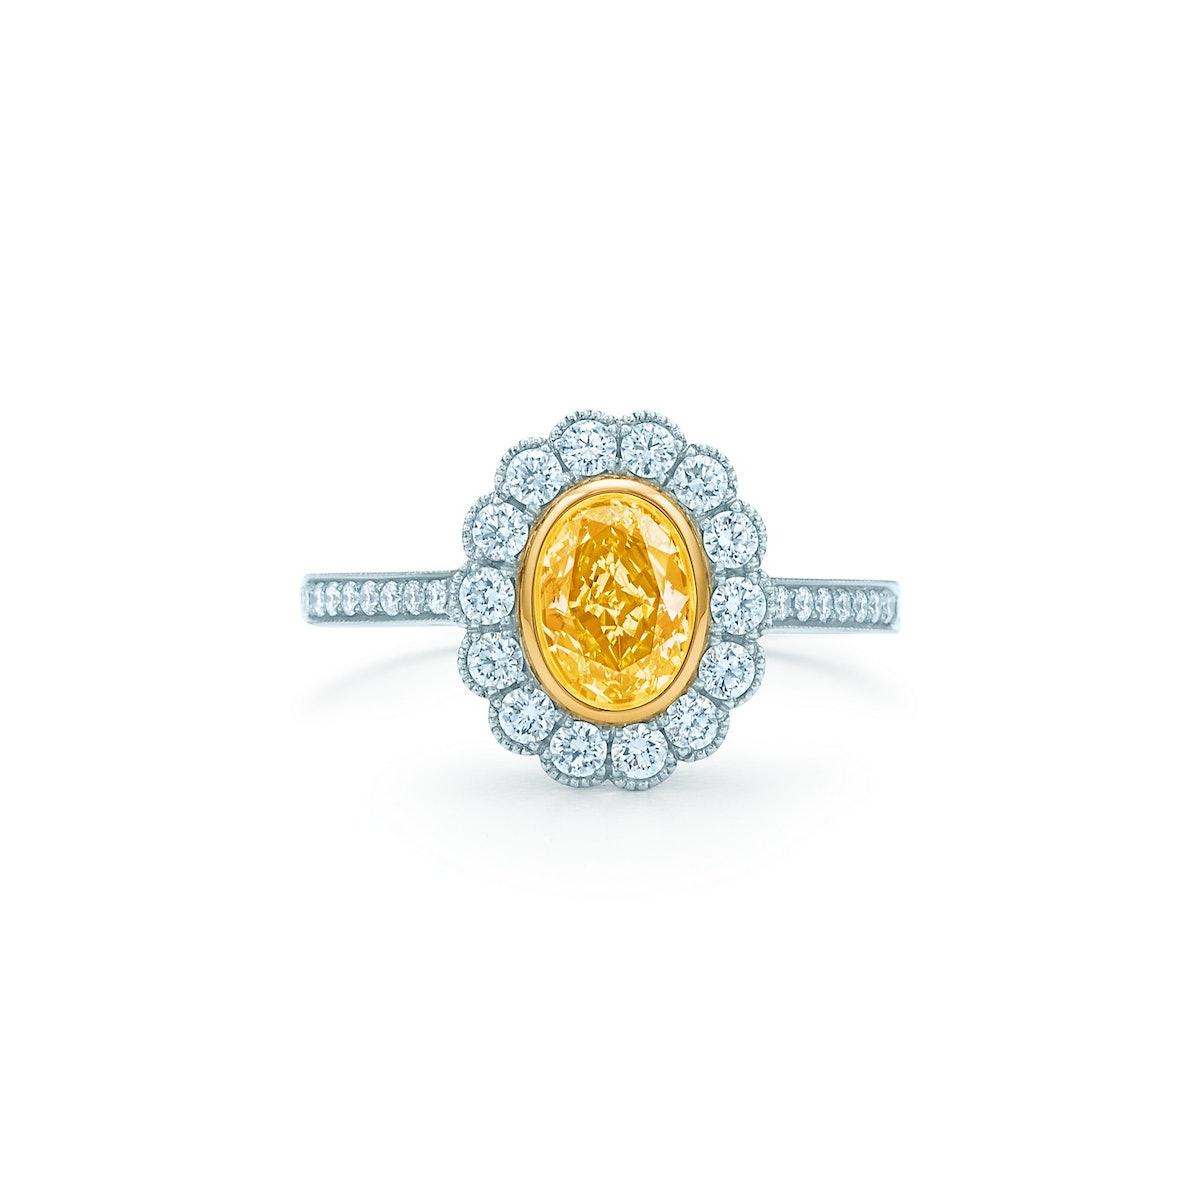 Tiffany & Co. Yellow Diamond Earrings